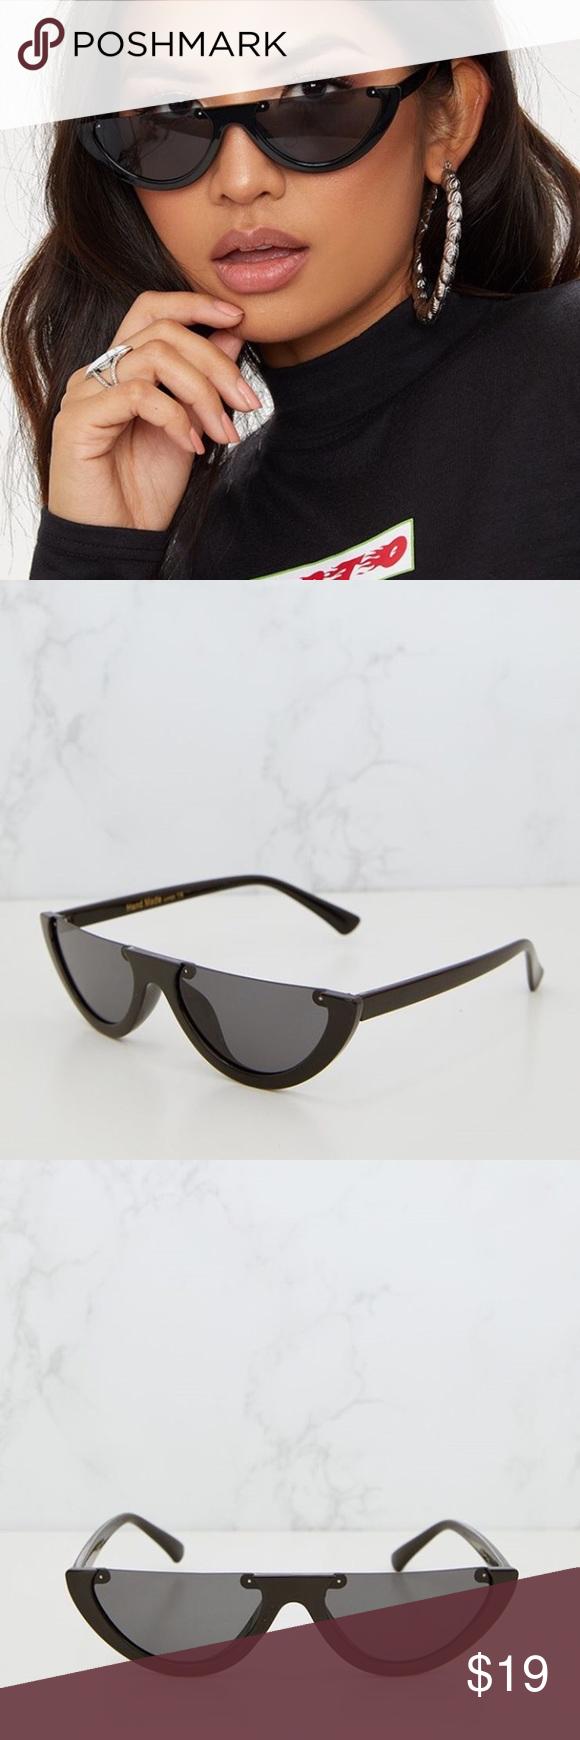 5391769798c Black Retro half frame sunglasses Black Rounded Half Frame Retro  SunglassesFinish off your ultra cool retro